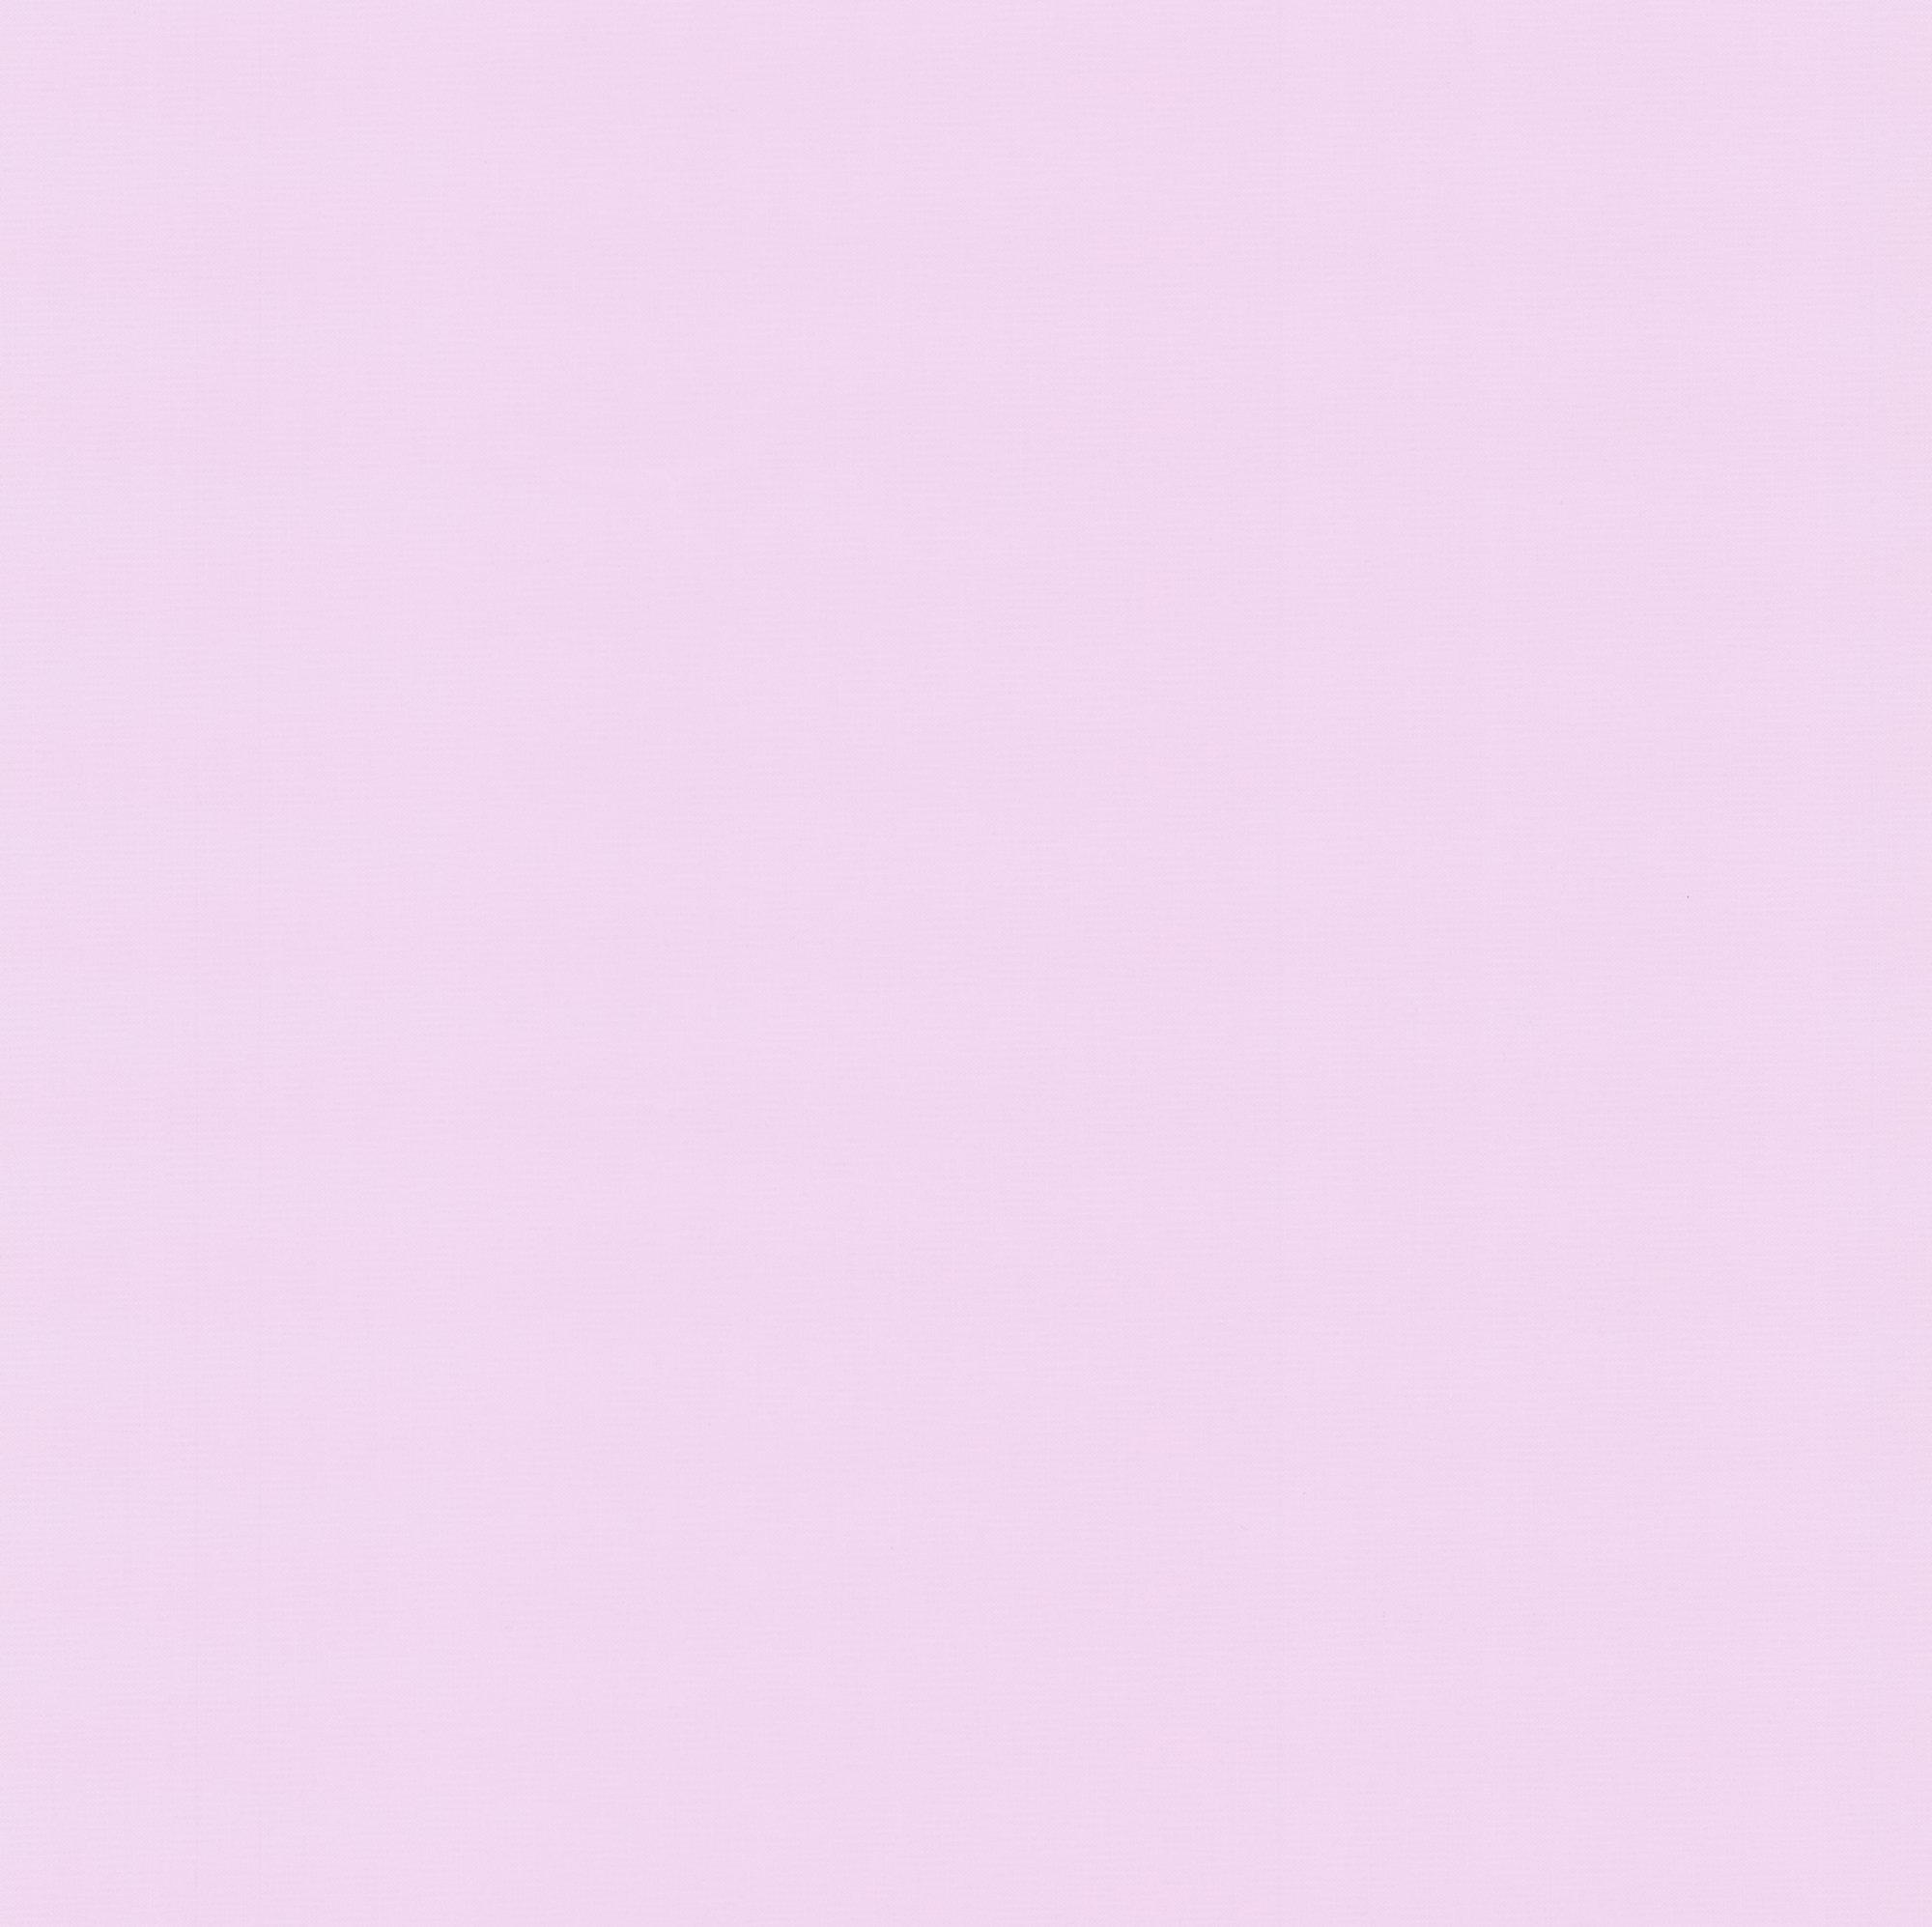 Pink Plain Wallpaper   Wallpapers High Definition 2000x1995